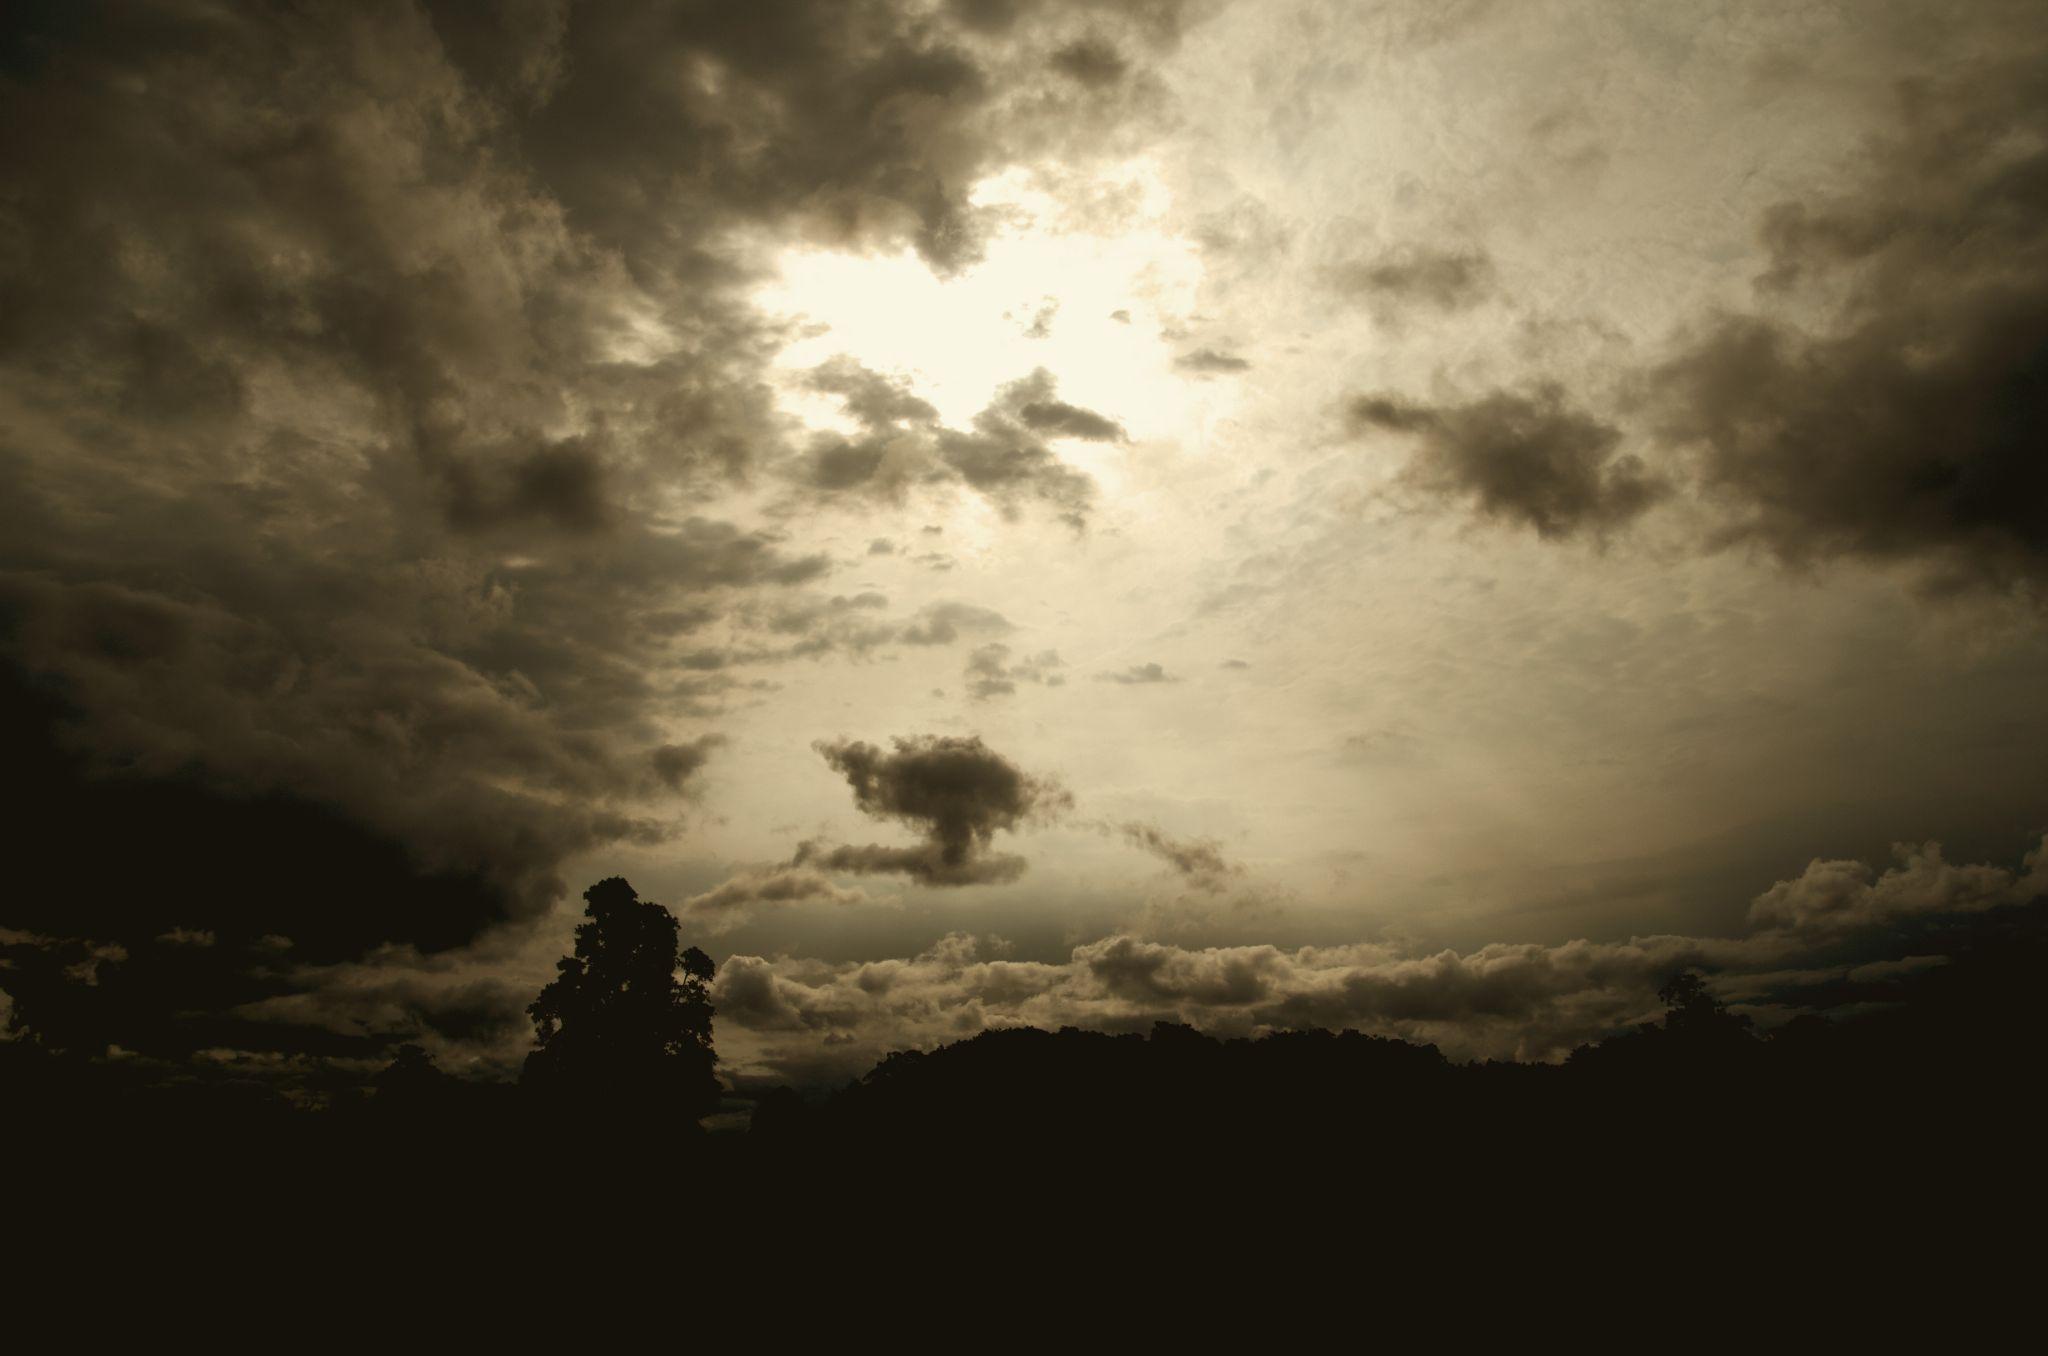 Into the dusk by Arindam Bhattacharjee